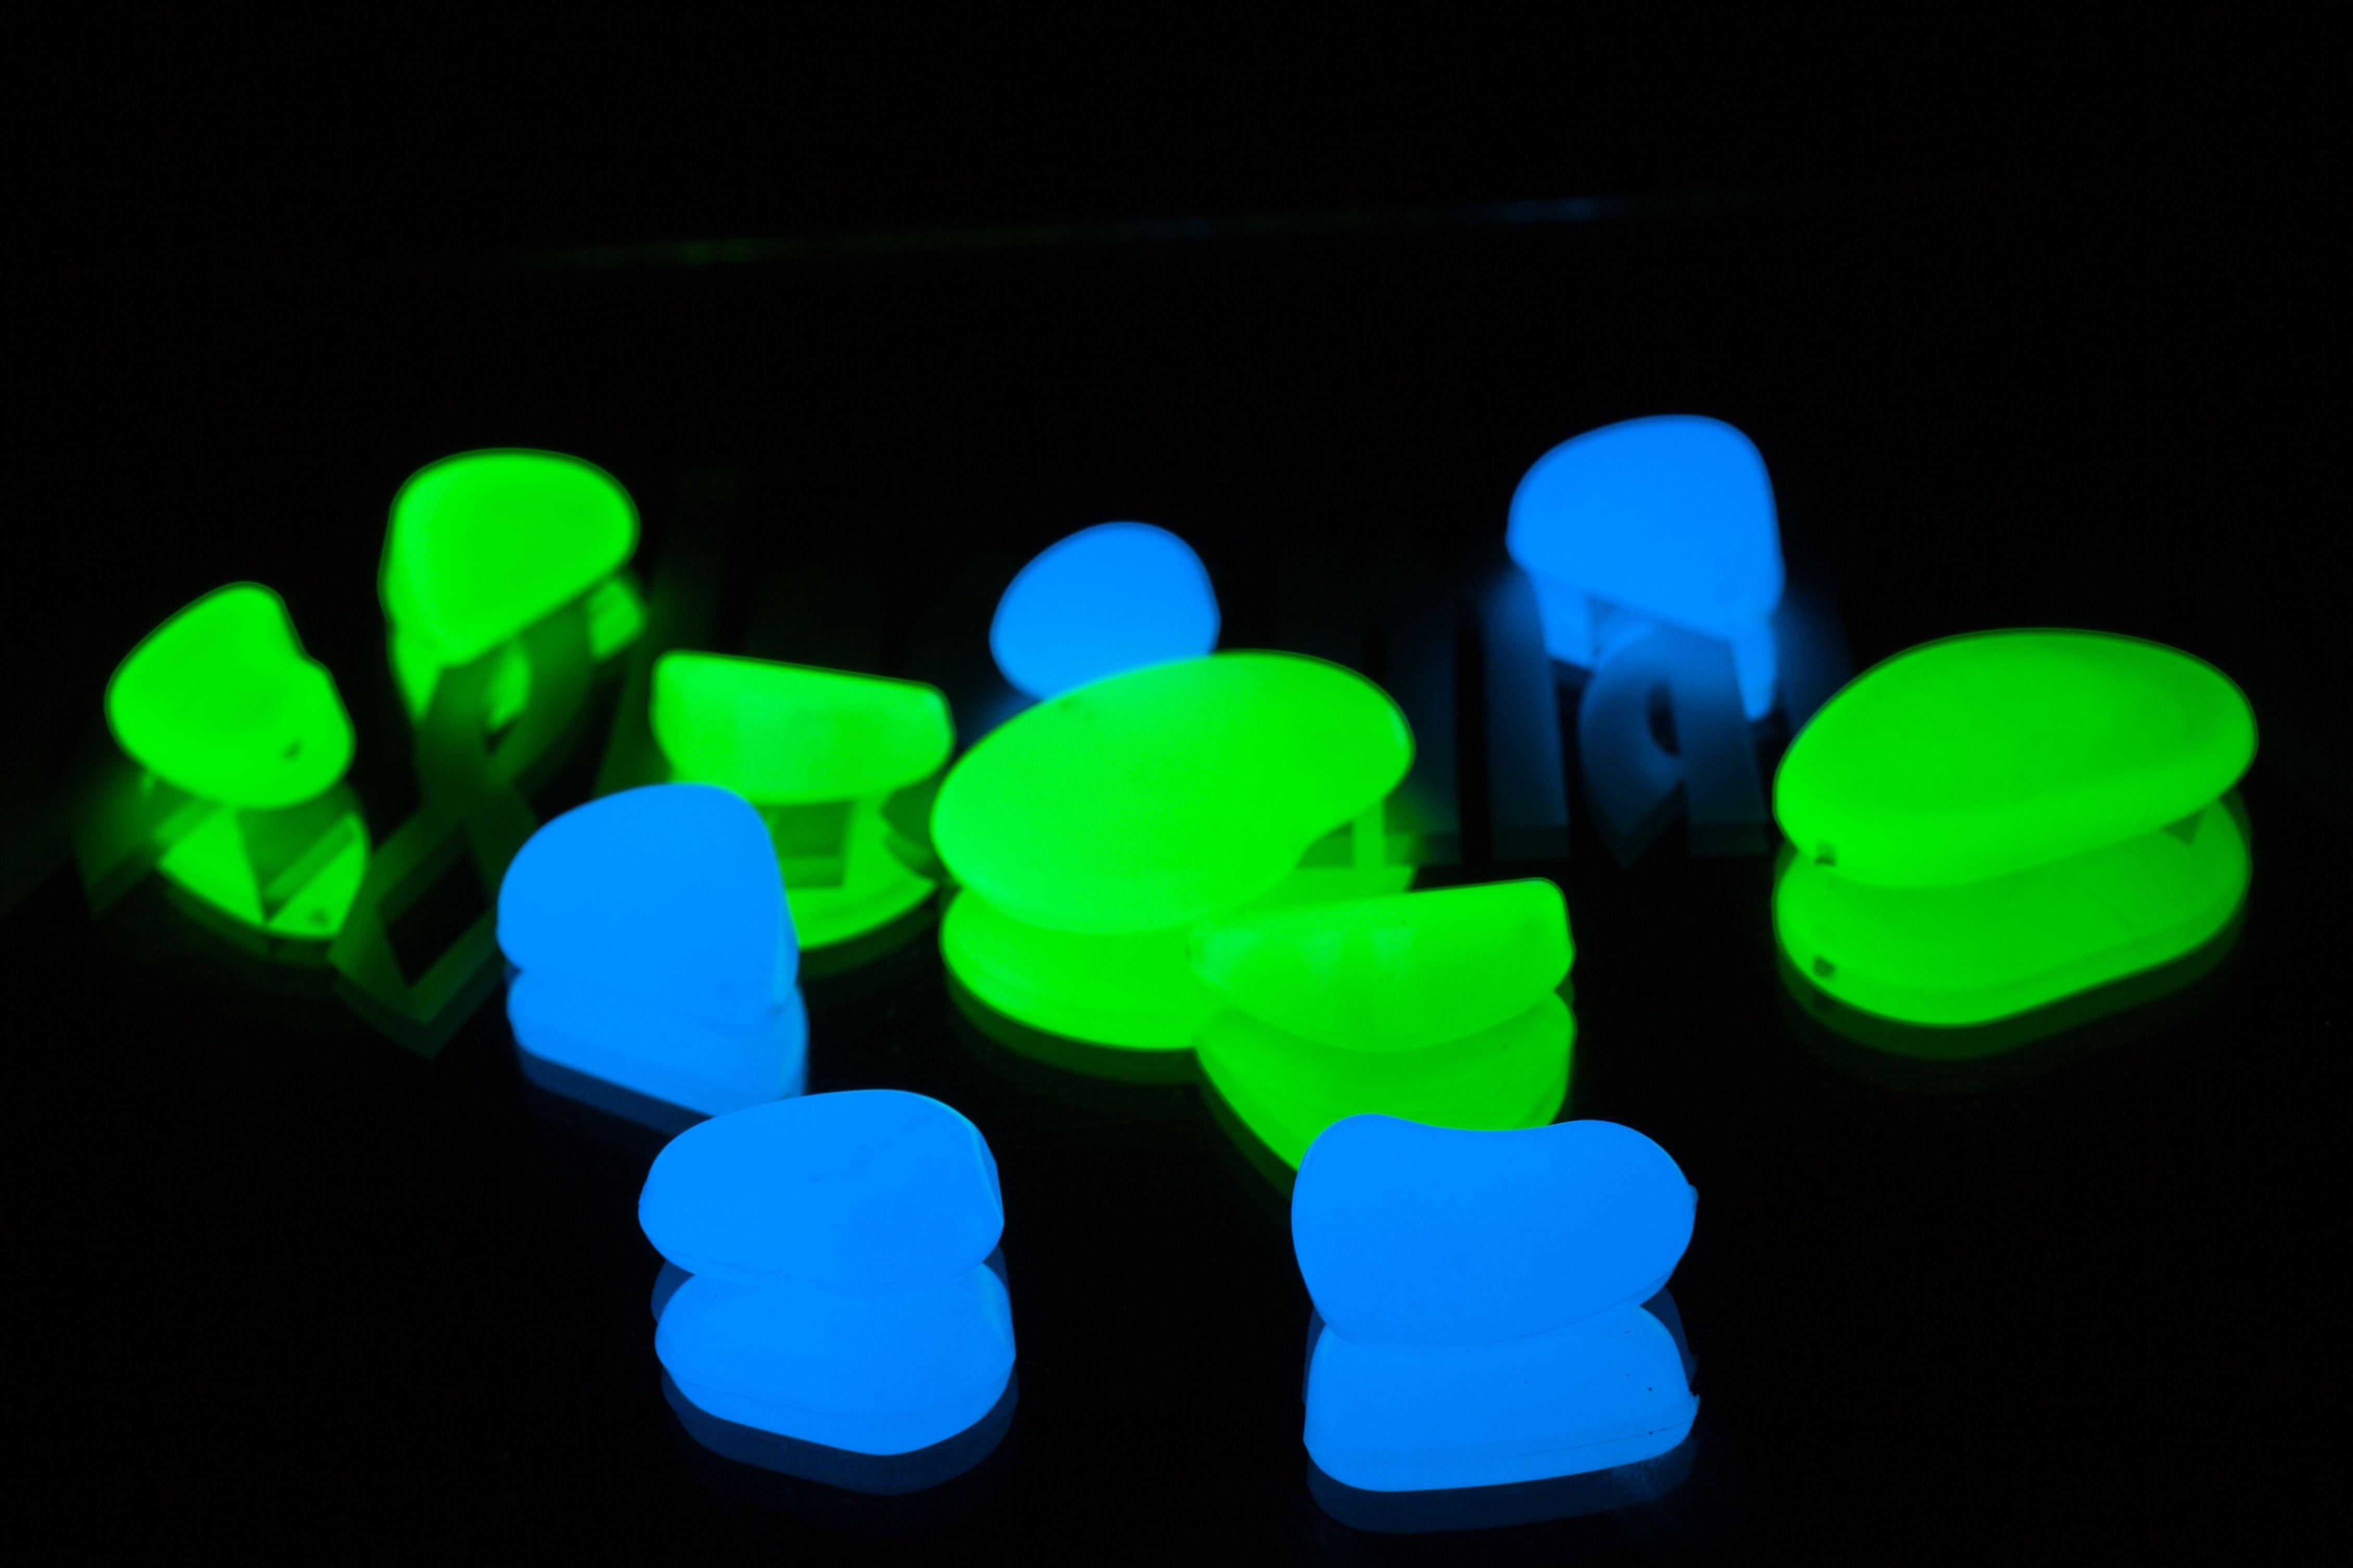 Phosphorescence et fluorescence : la différence.